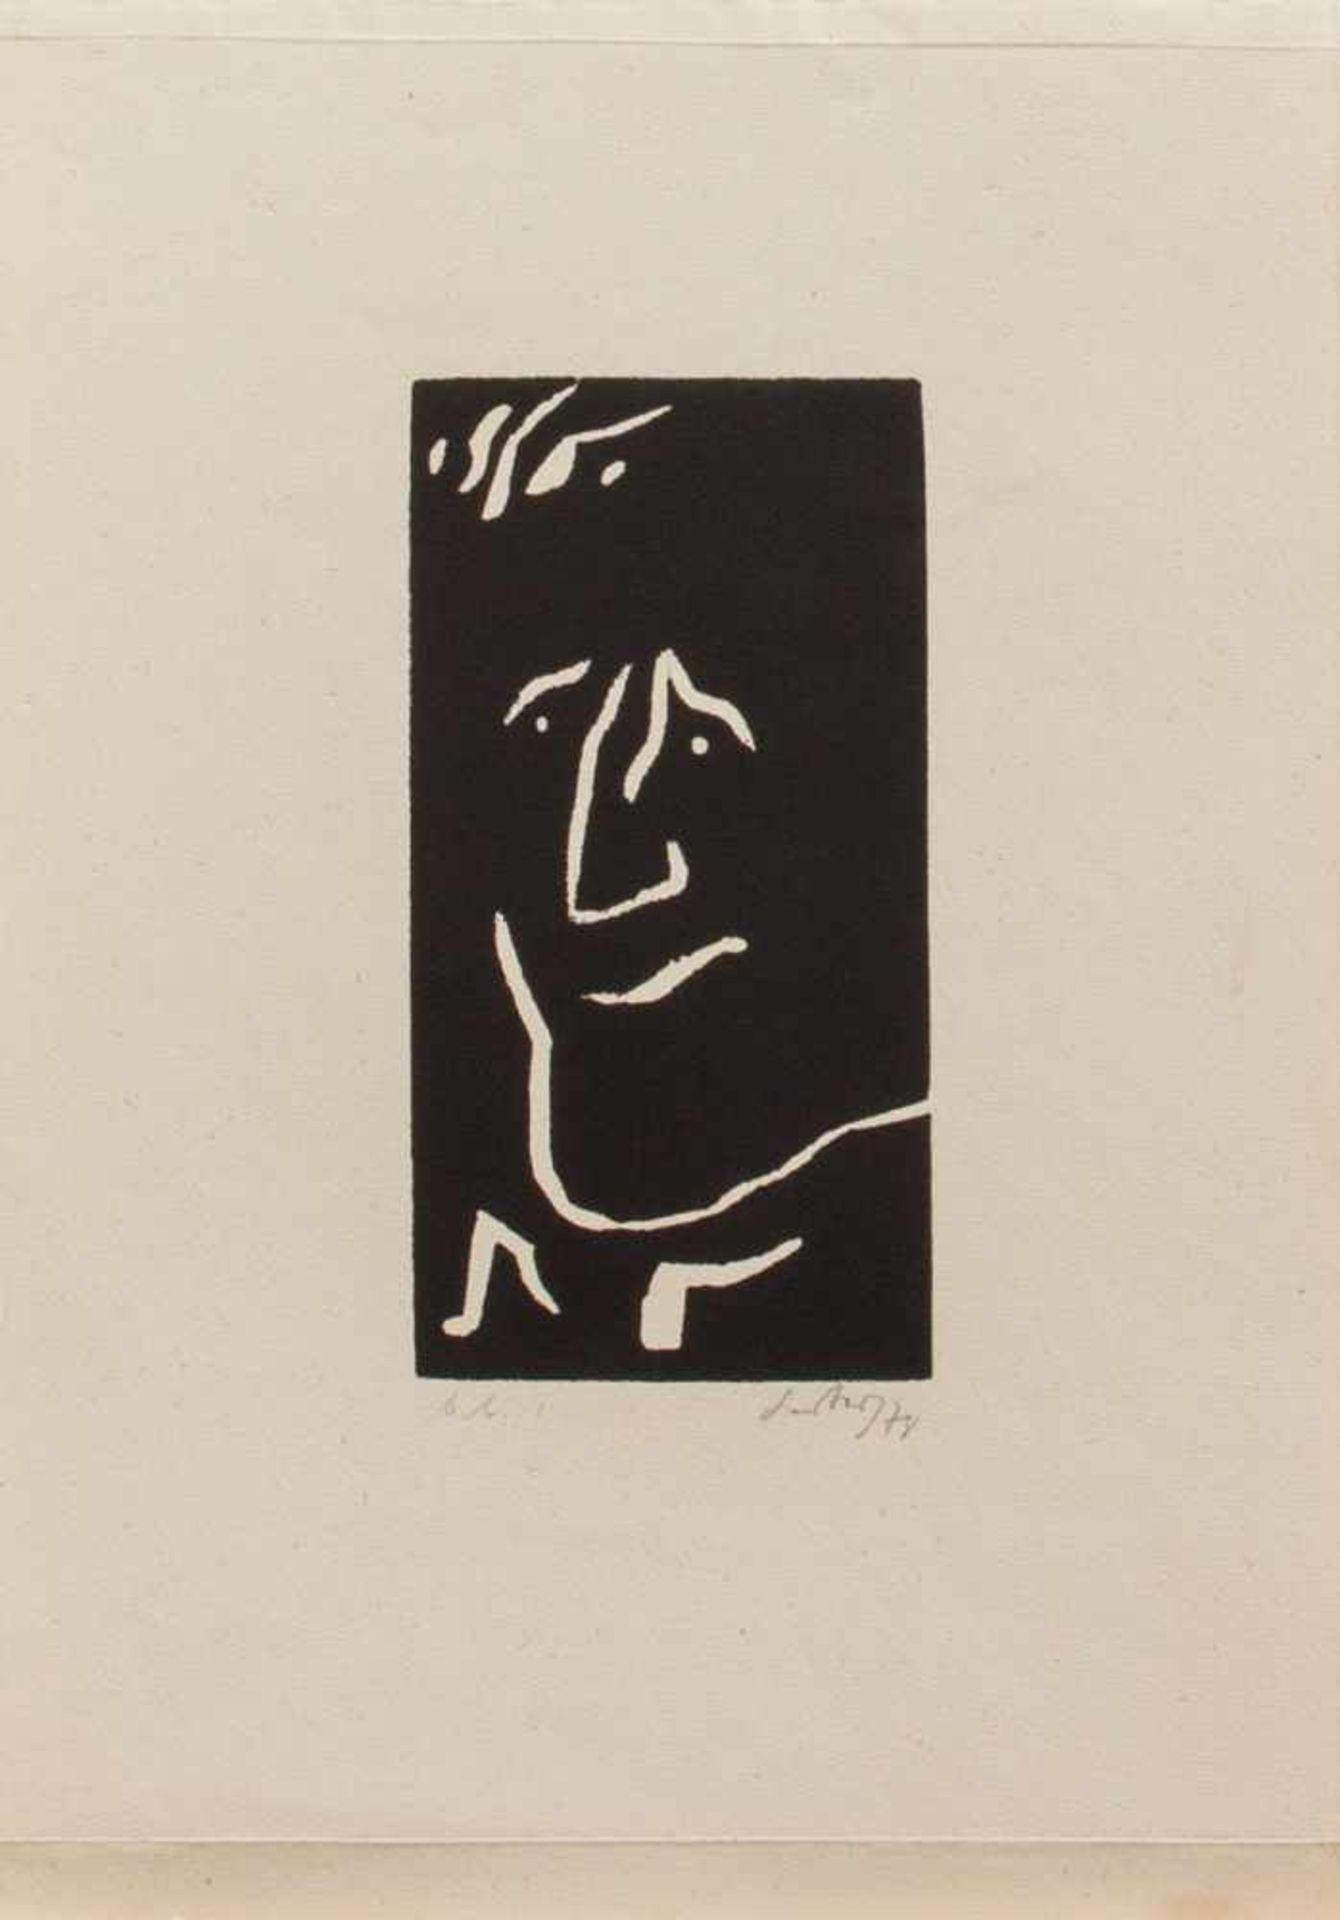 Herbert Sandberg(Posen 1908 - 1991 Berlin, deutscher Grafiker, Illustrator, Karikaturist u.